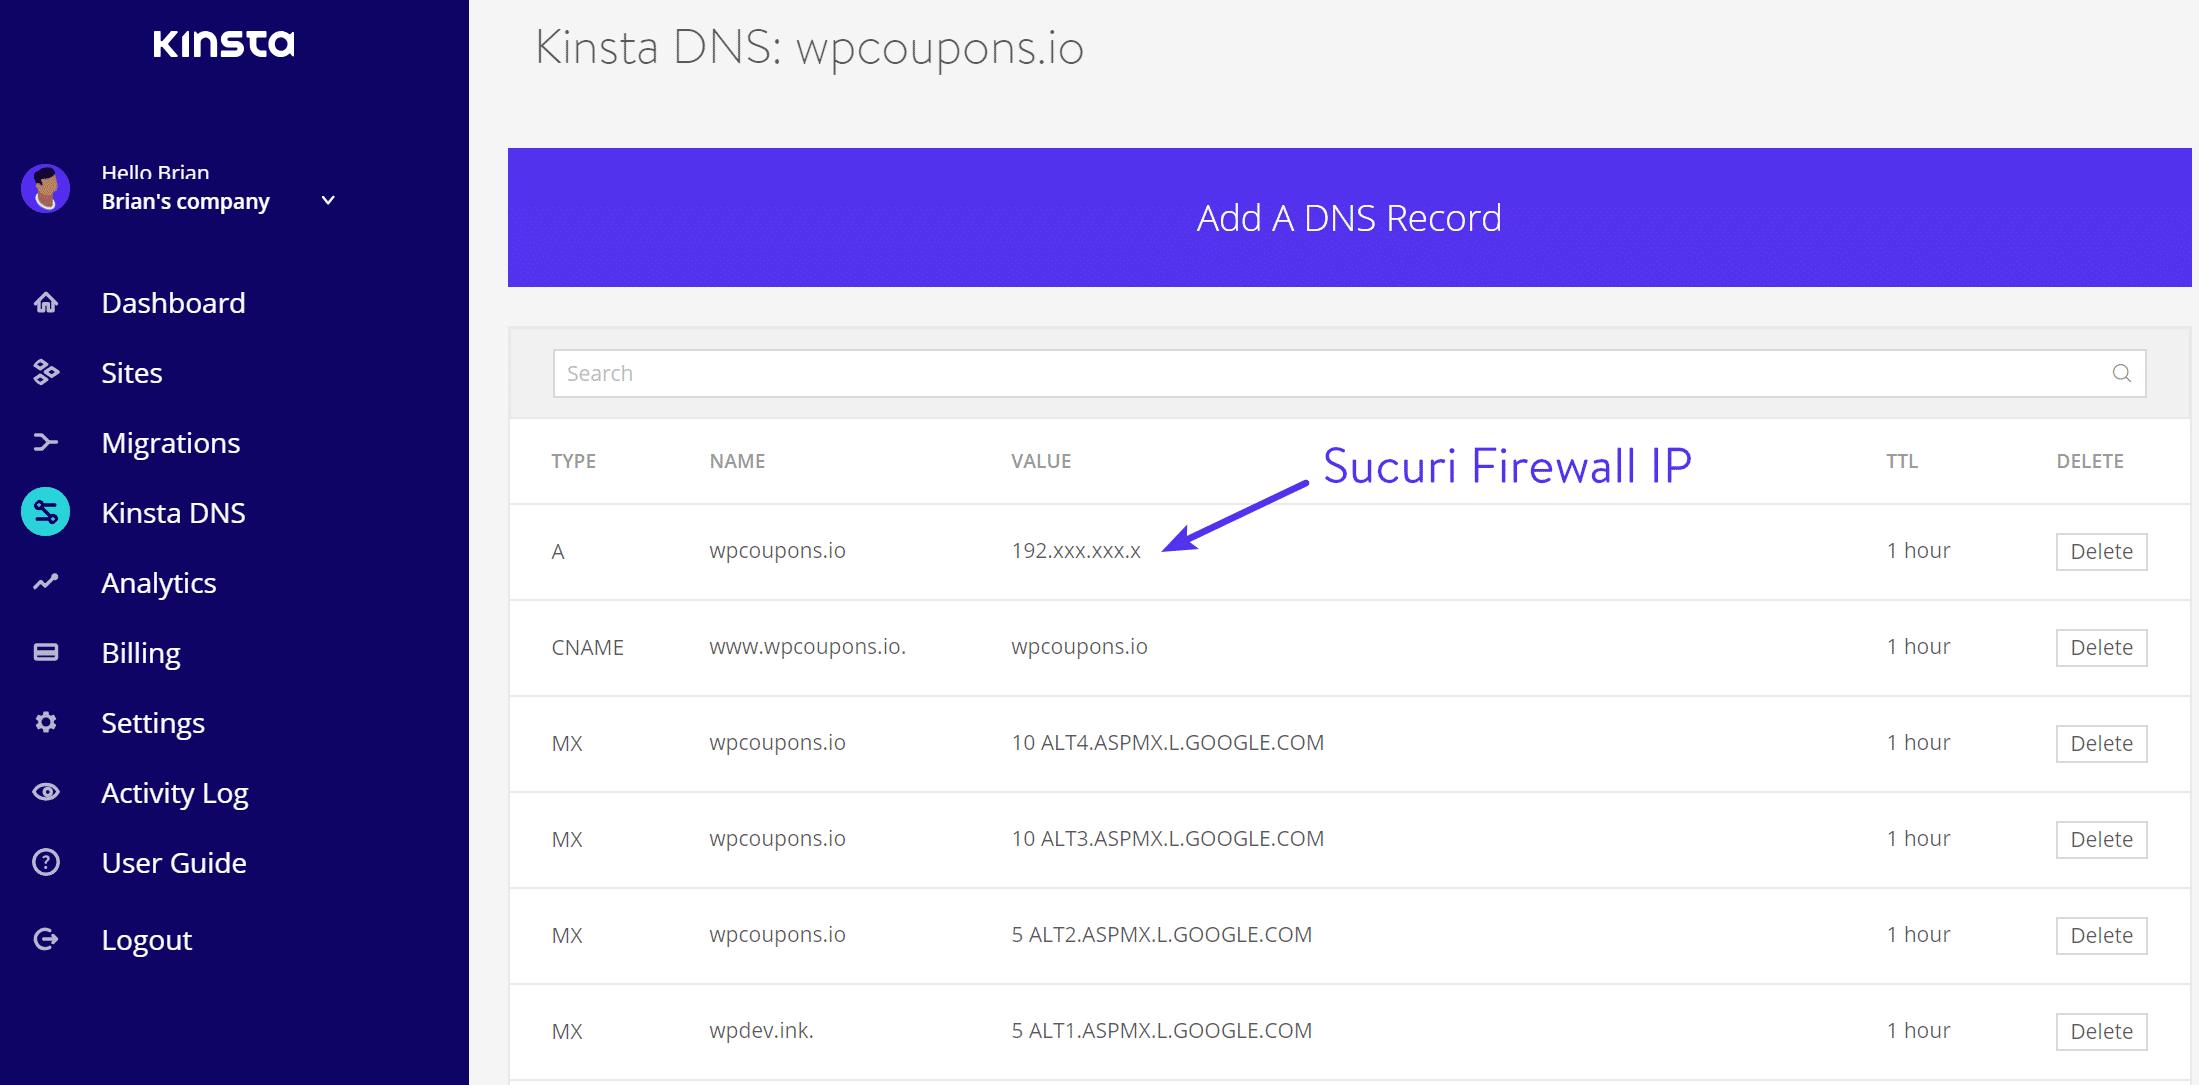 Sucuri Firewall IP